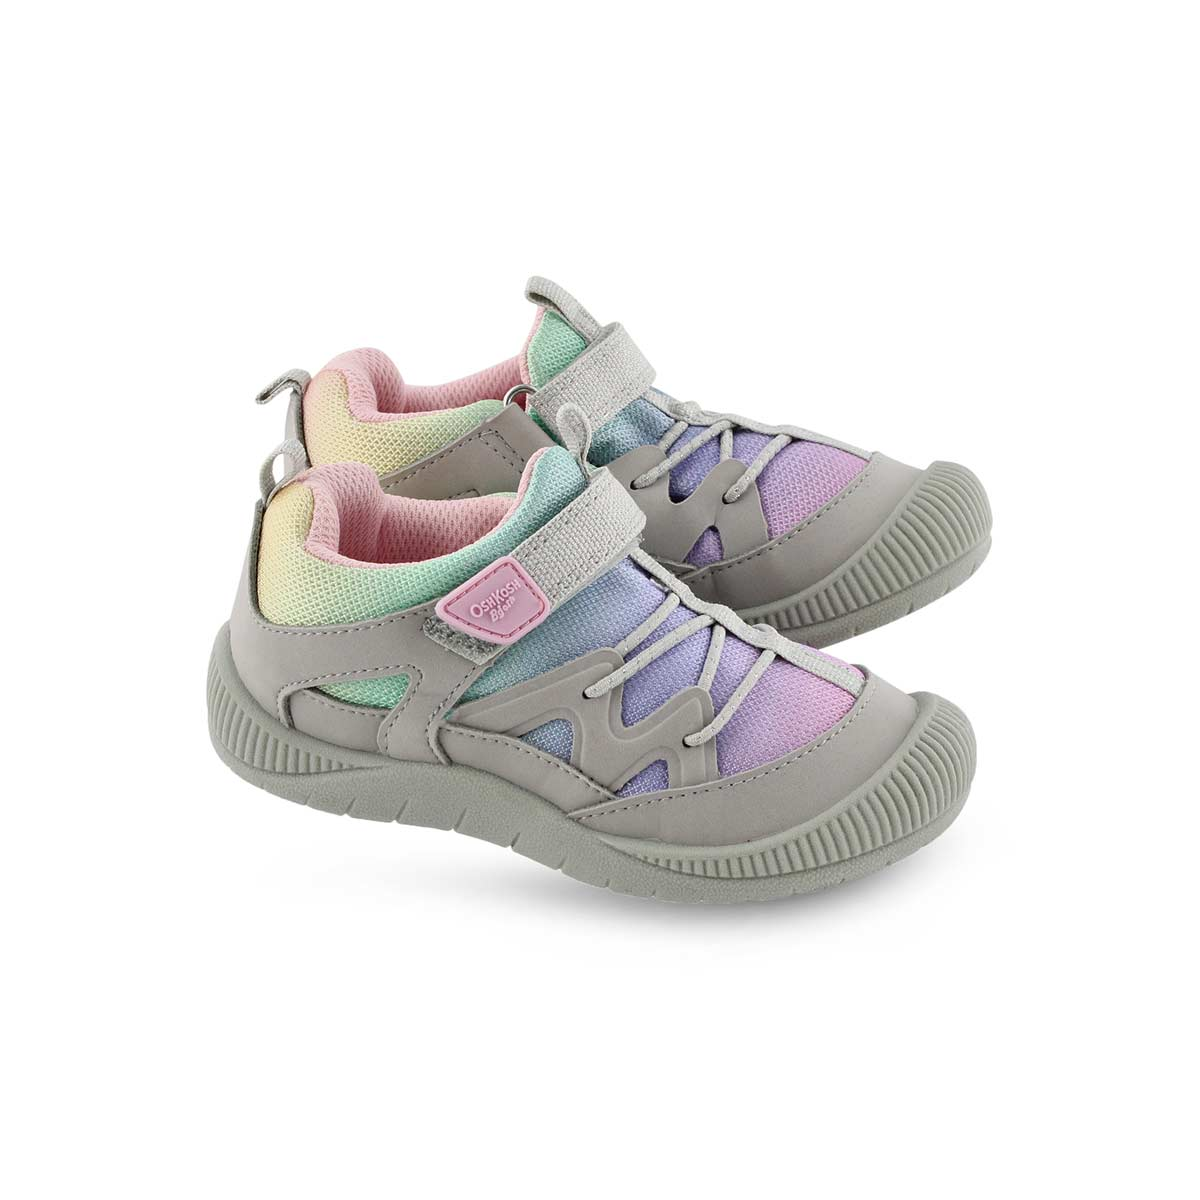 Inf-g Abis multi sneaker